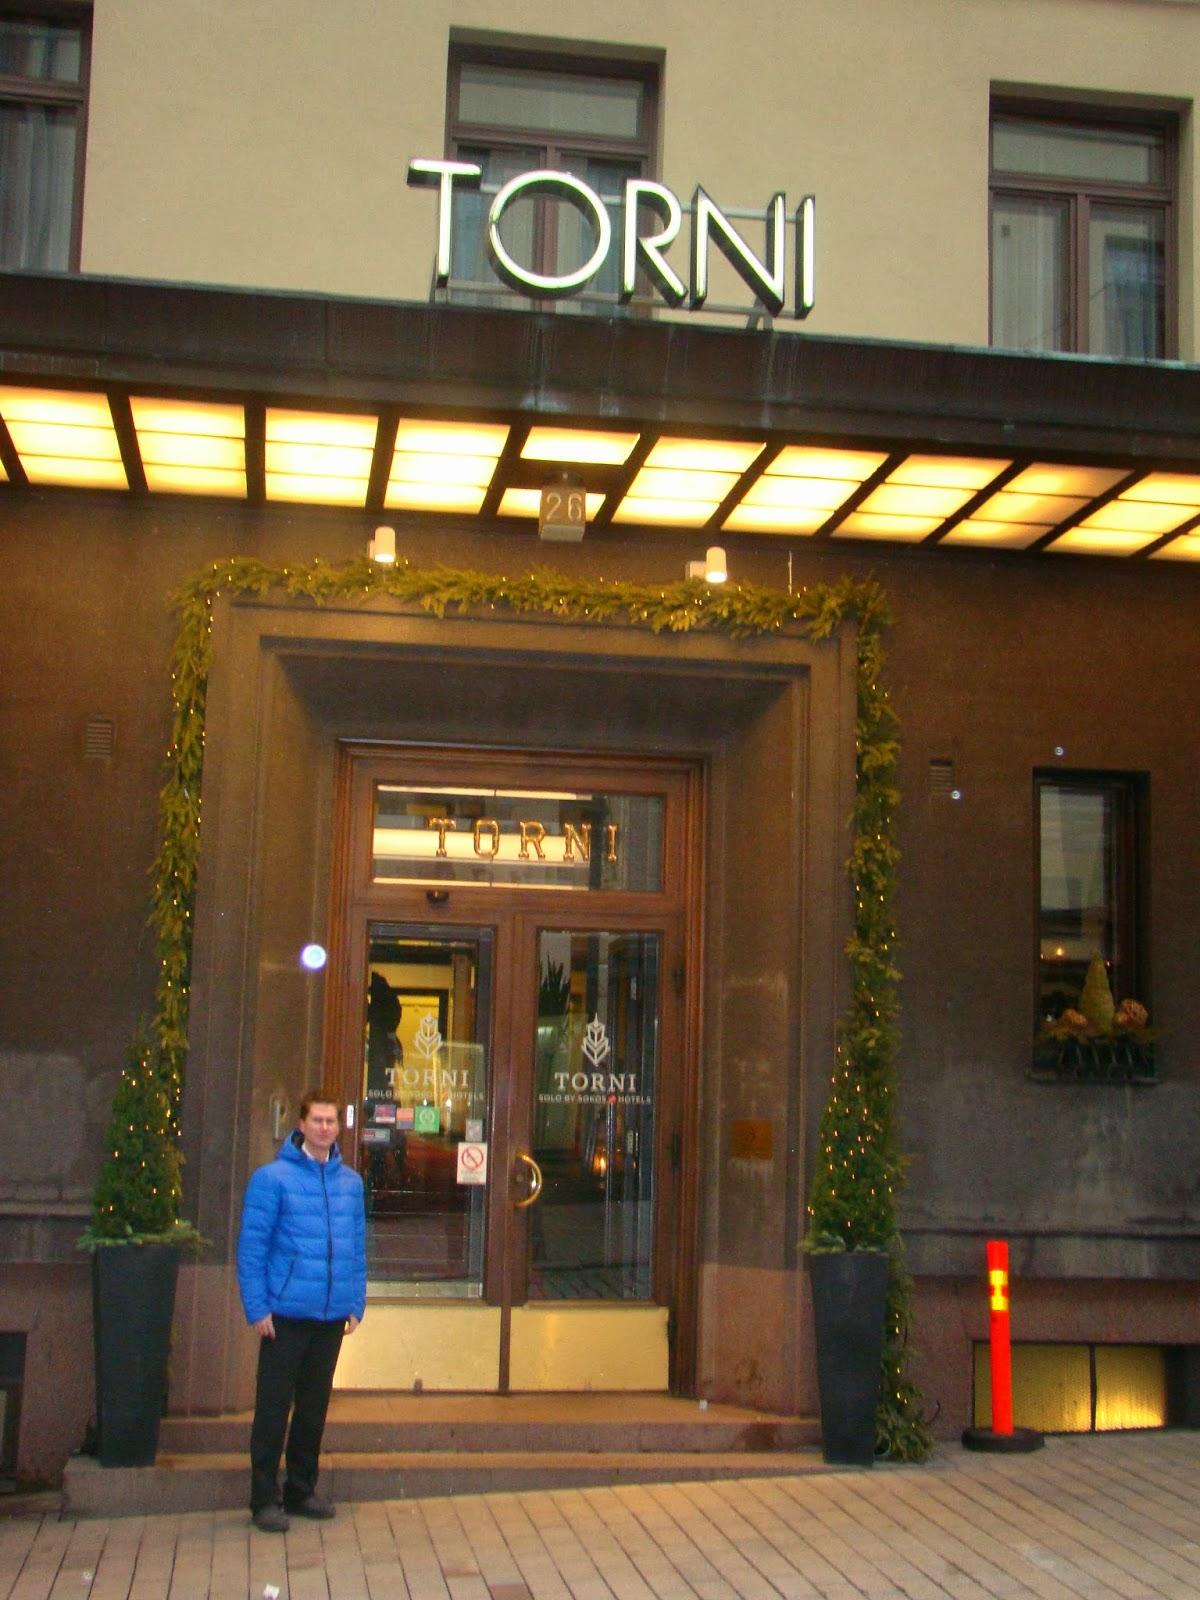 007 Travelers 007 Travel Story Helsinki Finland 2014